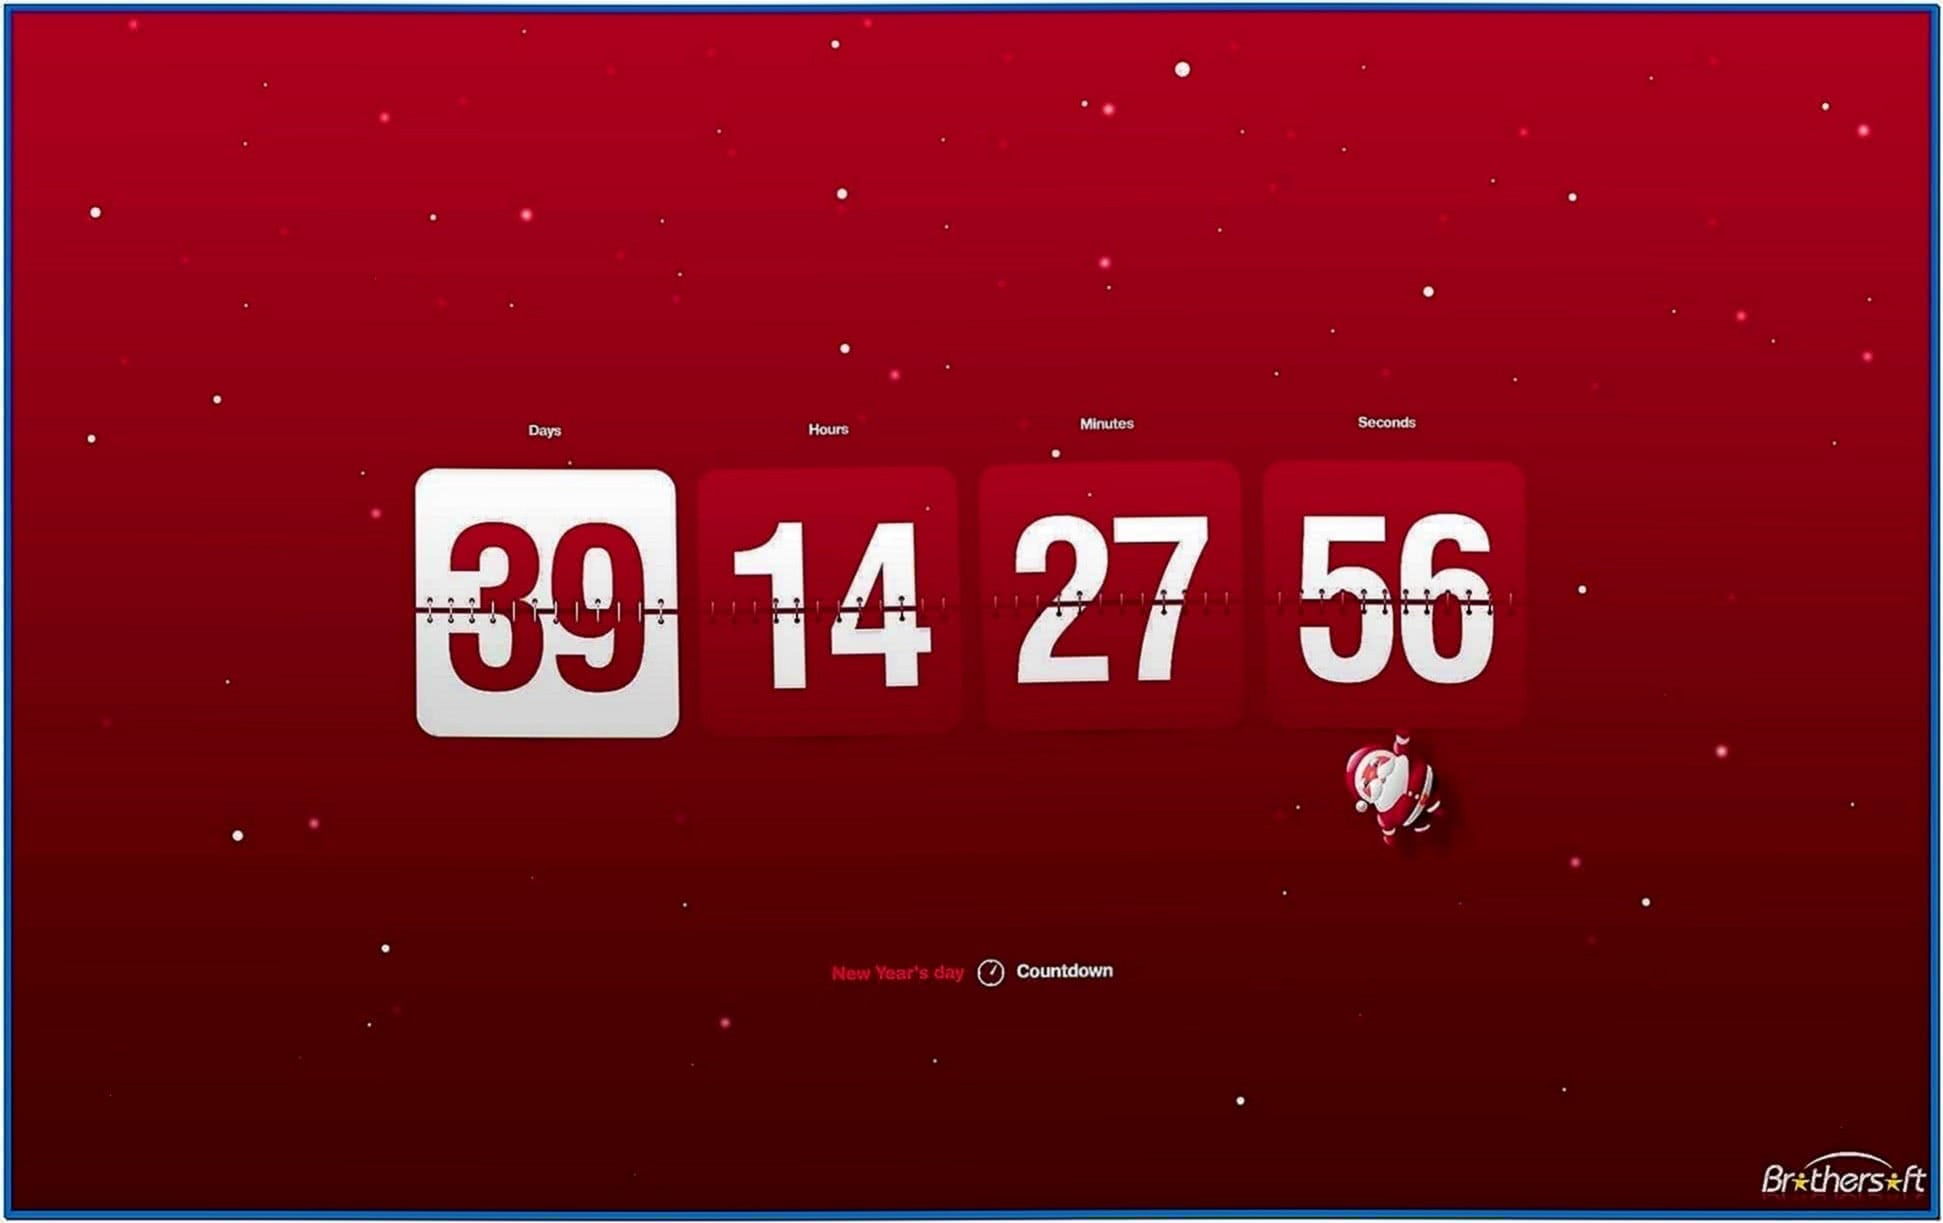 Countdown to Christmas Screensaver Mac